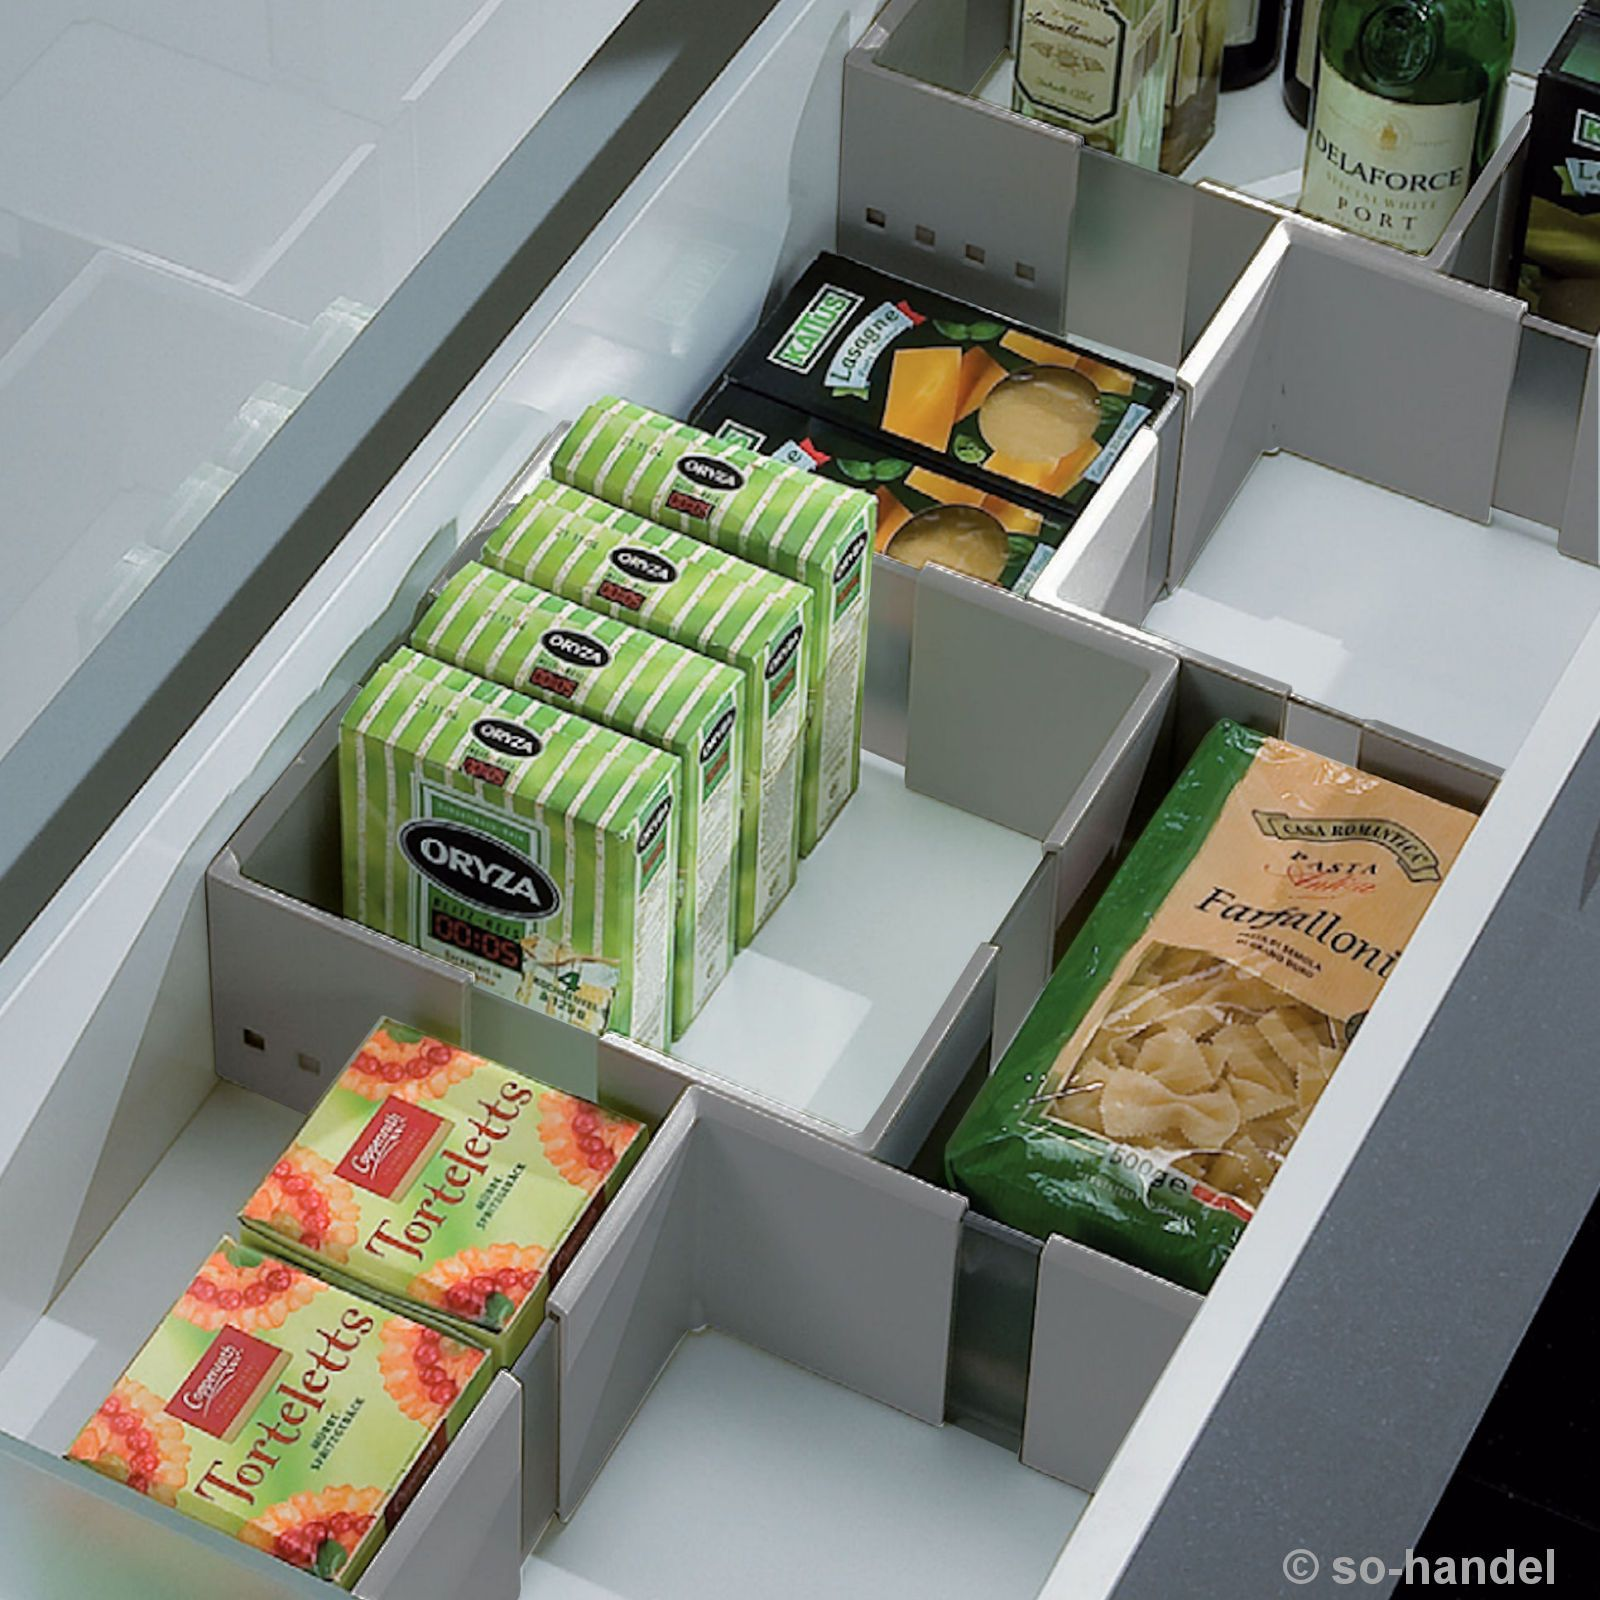 Cuisioflex Organisationsrahmen Schubladenteiler Schubladentrenner Schubladenteiler Schubladen Schubladen Organizer